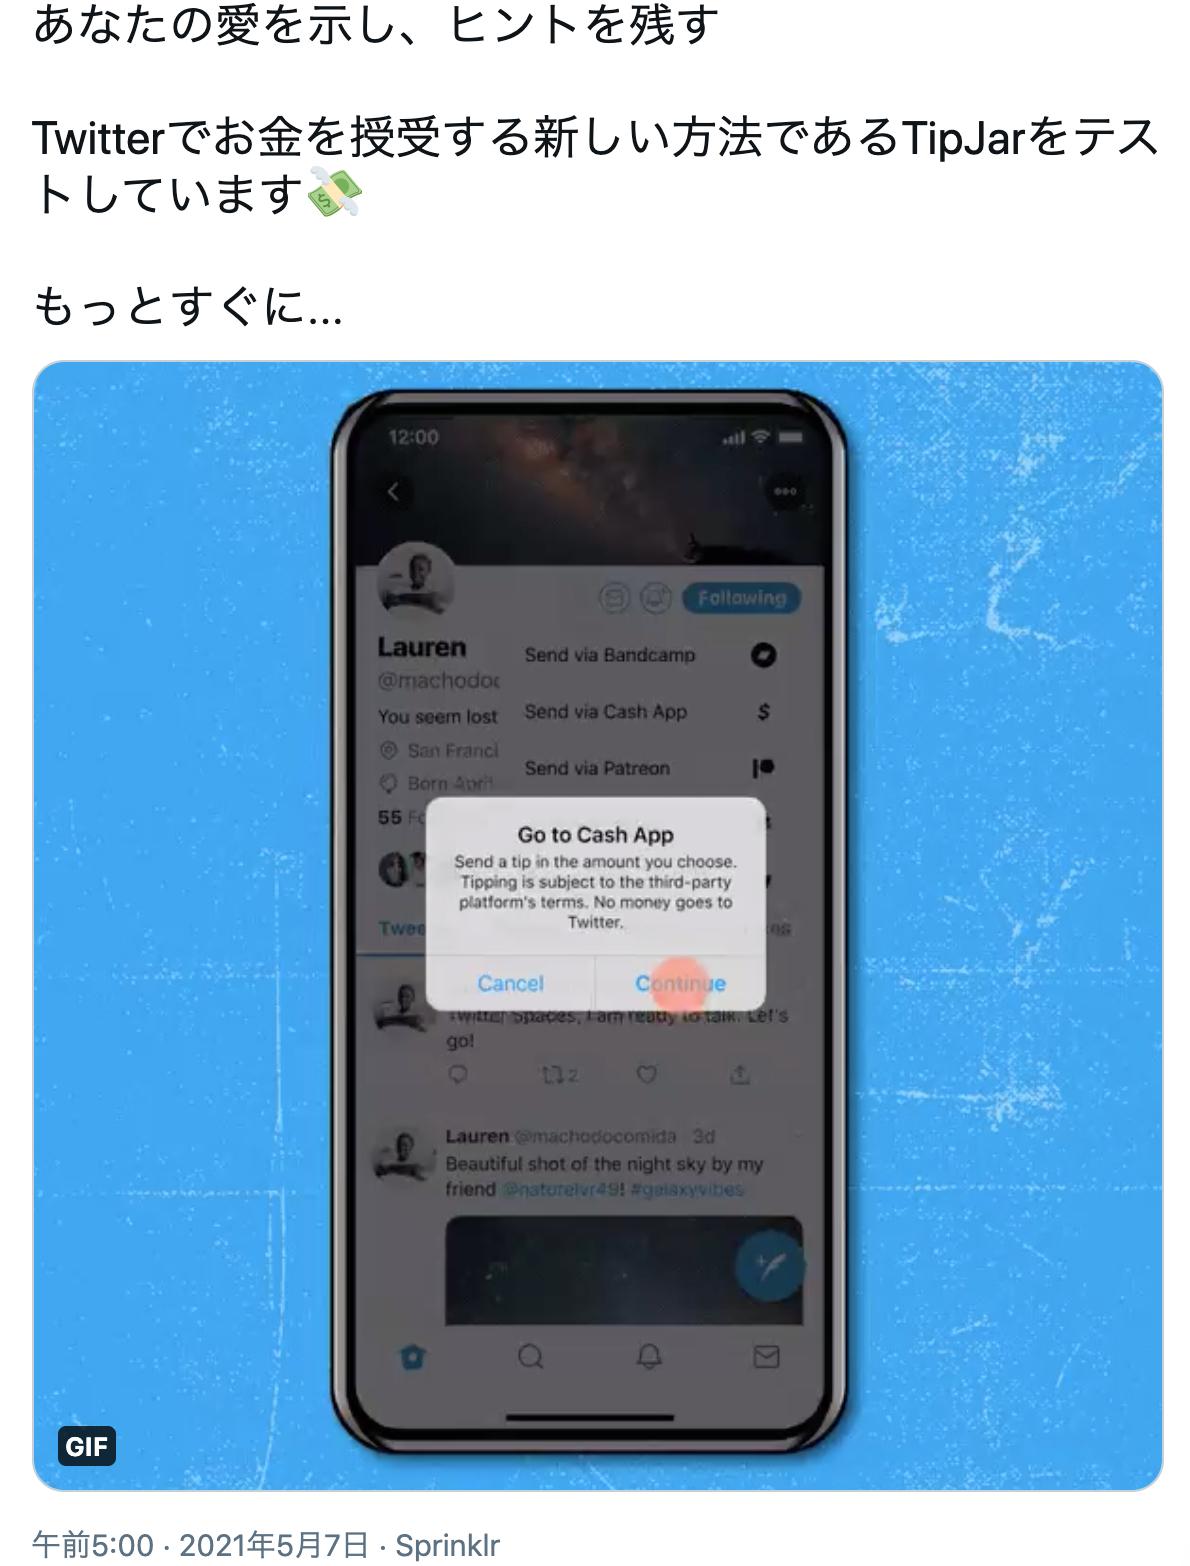 Twitter社「TipJar」テストを伝えるツイート